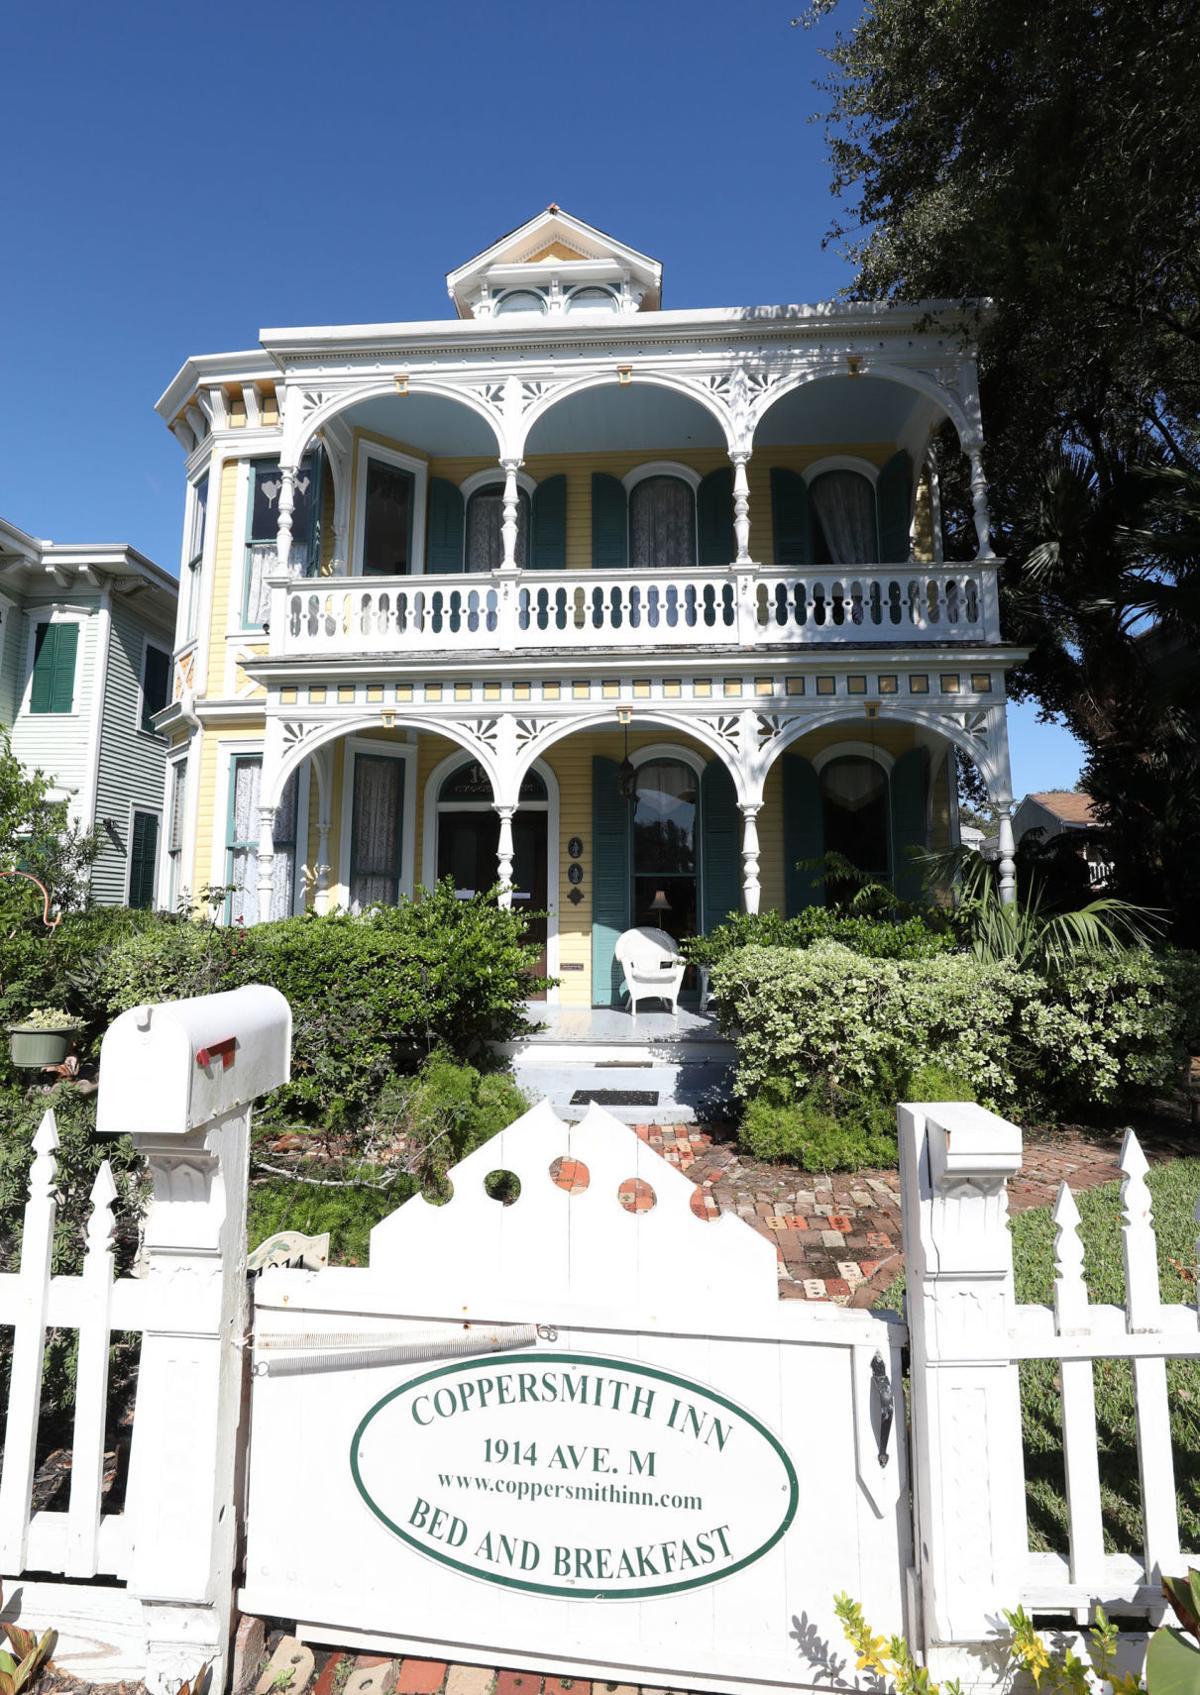 Coppersmith Inn